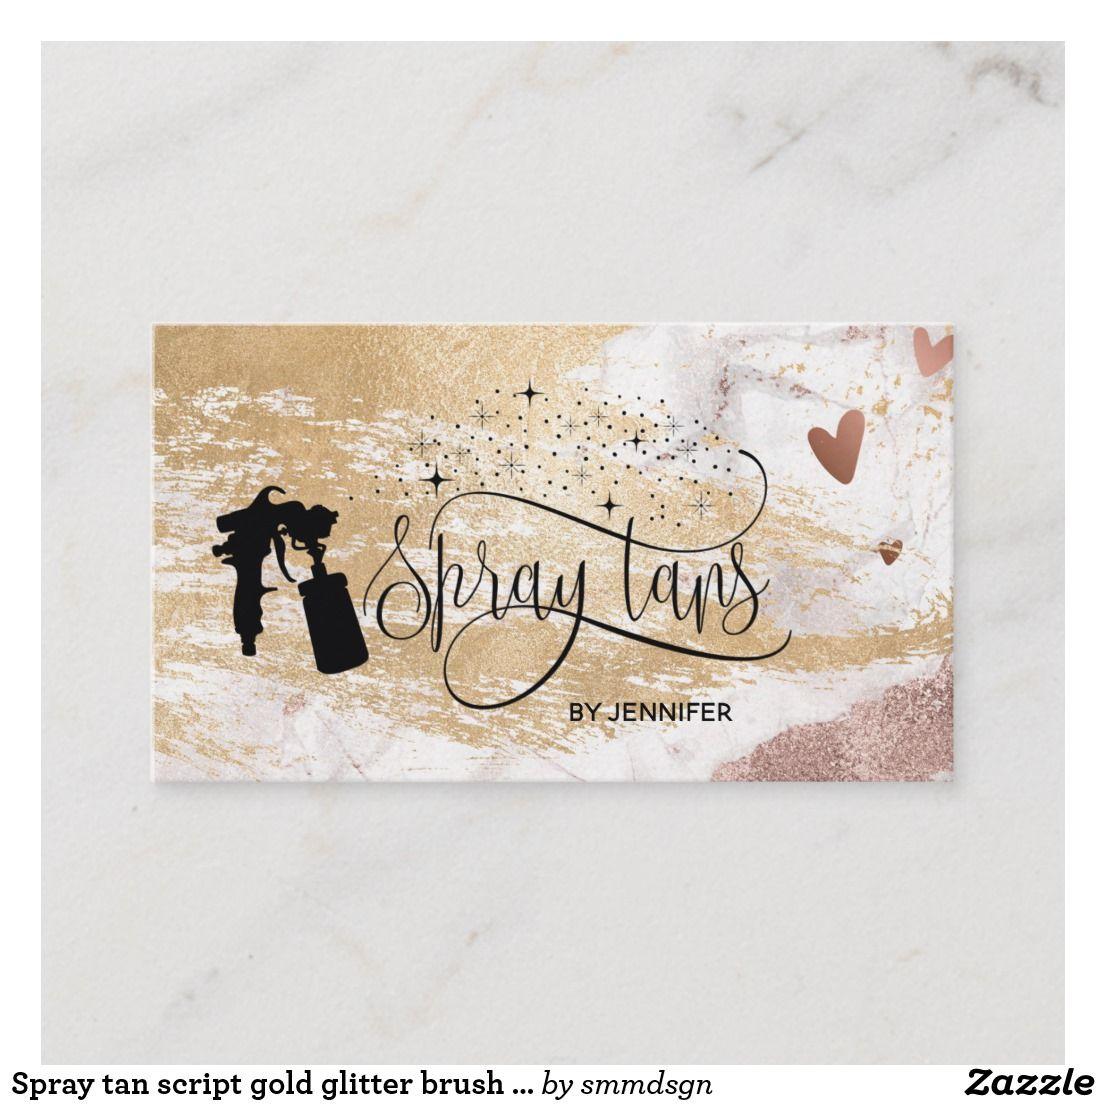 Spray Tan Script Gold Glitter Brush Stroke Hearts Business Card Zazzle Com Spray Tanning Spray Tan Business Spray Tan Business Cards